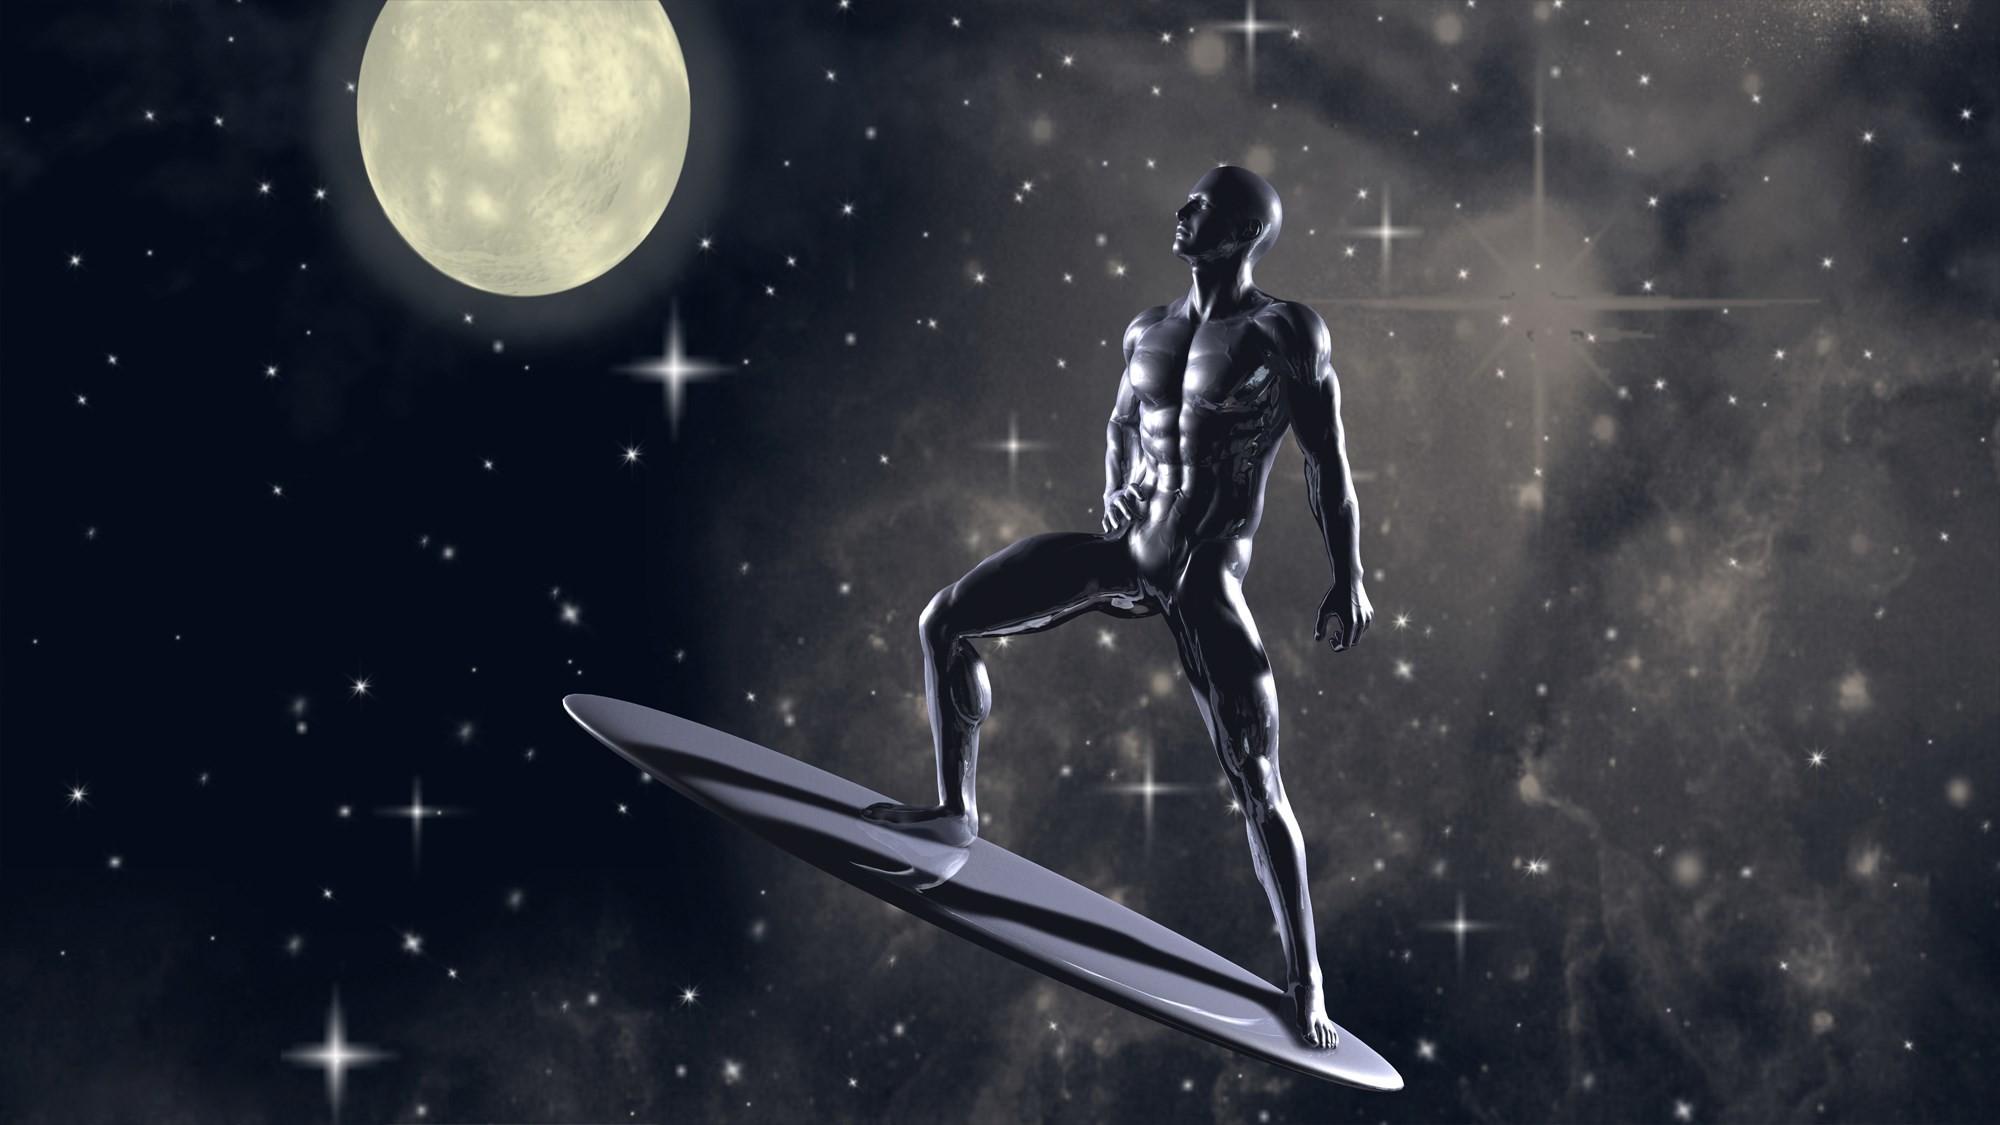 Silver Surfer Wallpaper High Resolution: Silver Surfer Wallpaper (50+ Images